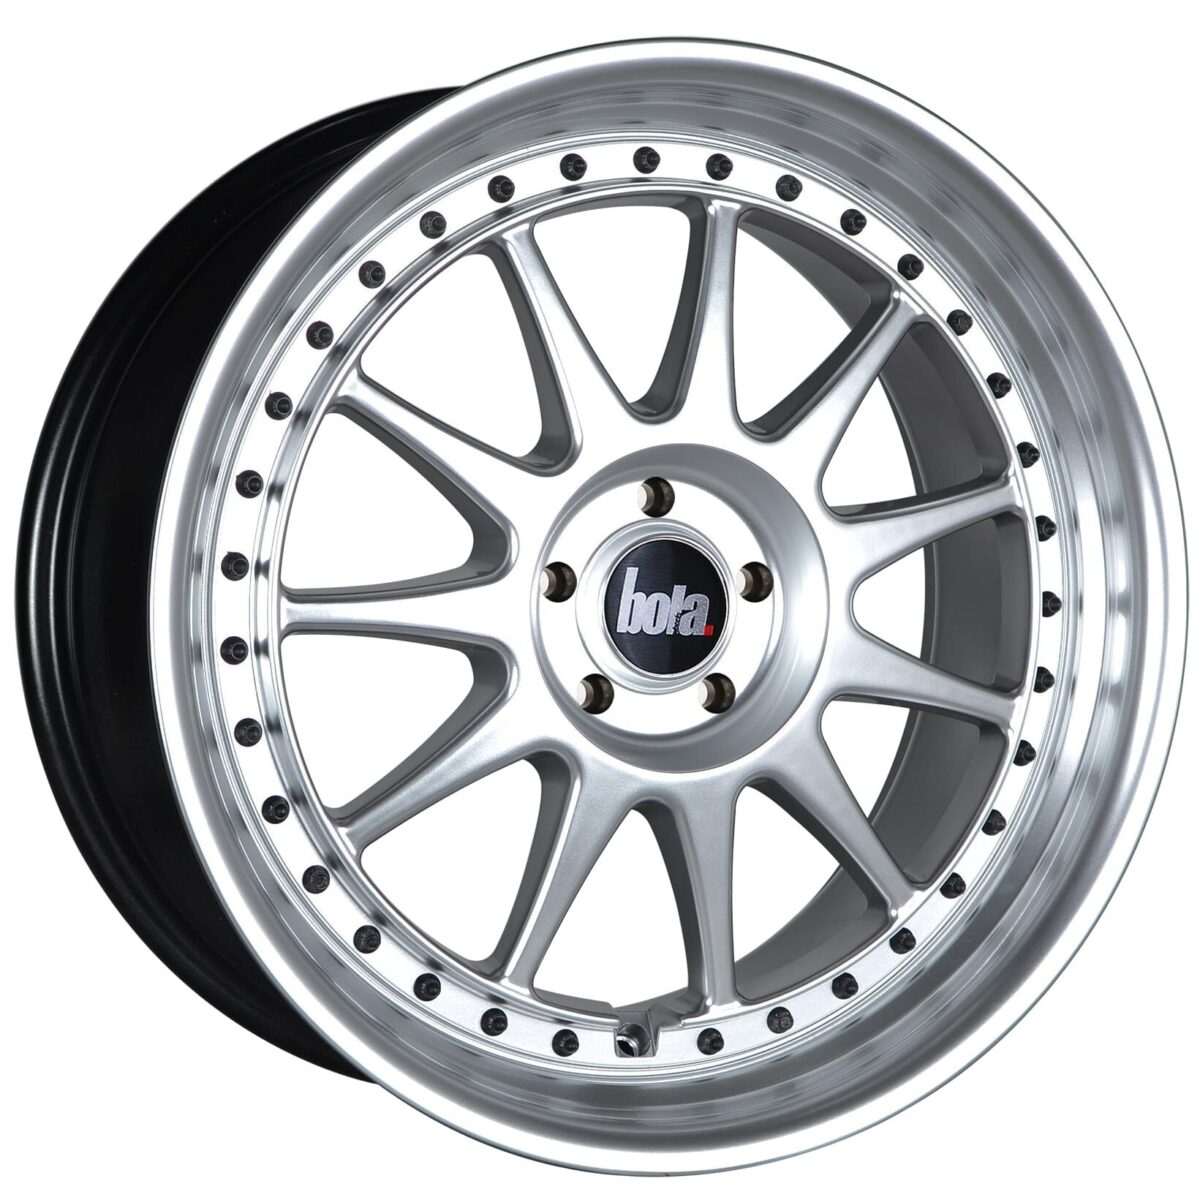 "18"" BOLA B4 Wheels - Hyper Silver with Black Rivets - VW / Audi / Mercedes - 5x112"